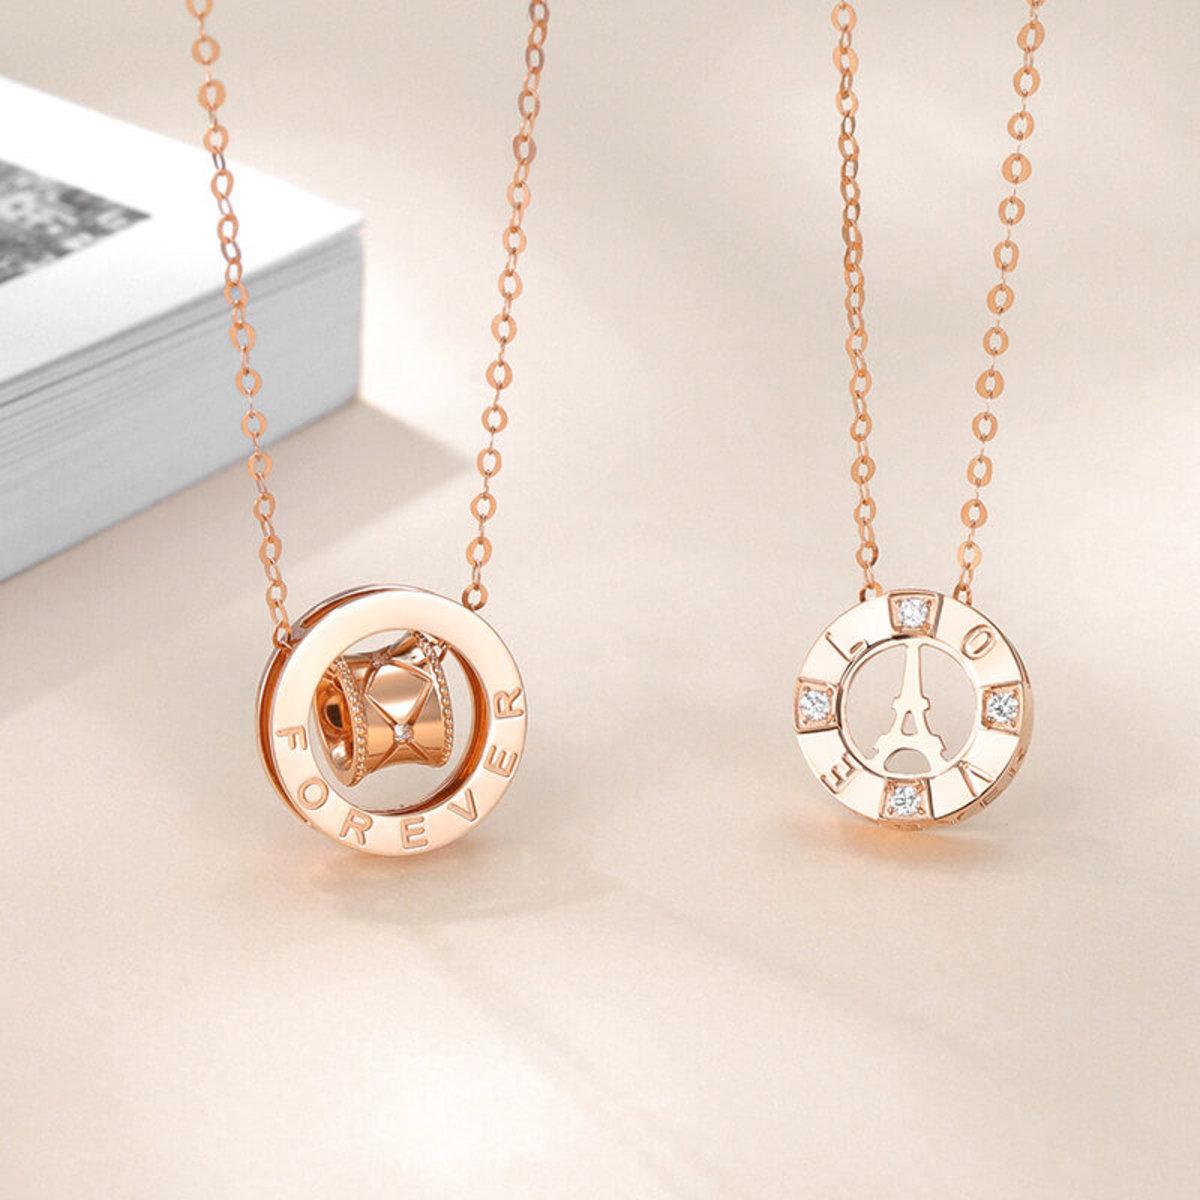 18k Rose Gold Diamond Necklace (0.068 ct. tw.)